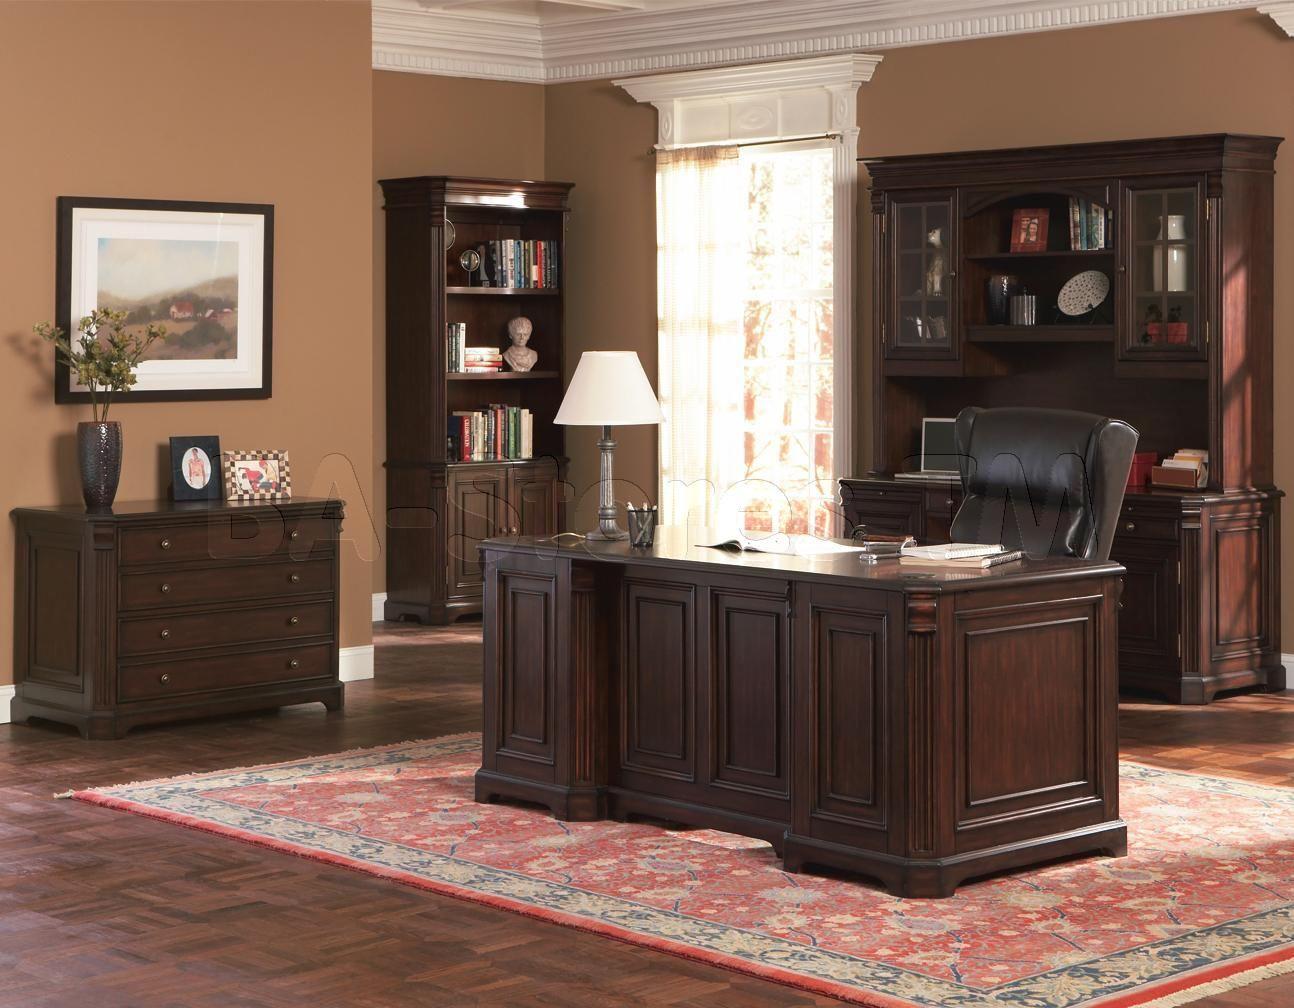 5 PC Home Office Executive Set  Desk  Computer Desk with Hutch  File Cabinet. 5 PC Home Office Executive Set  Desk  Computer Desk with Hutch